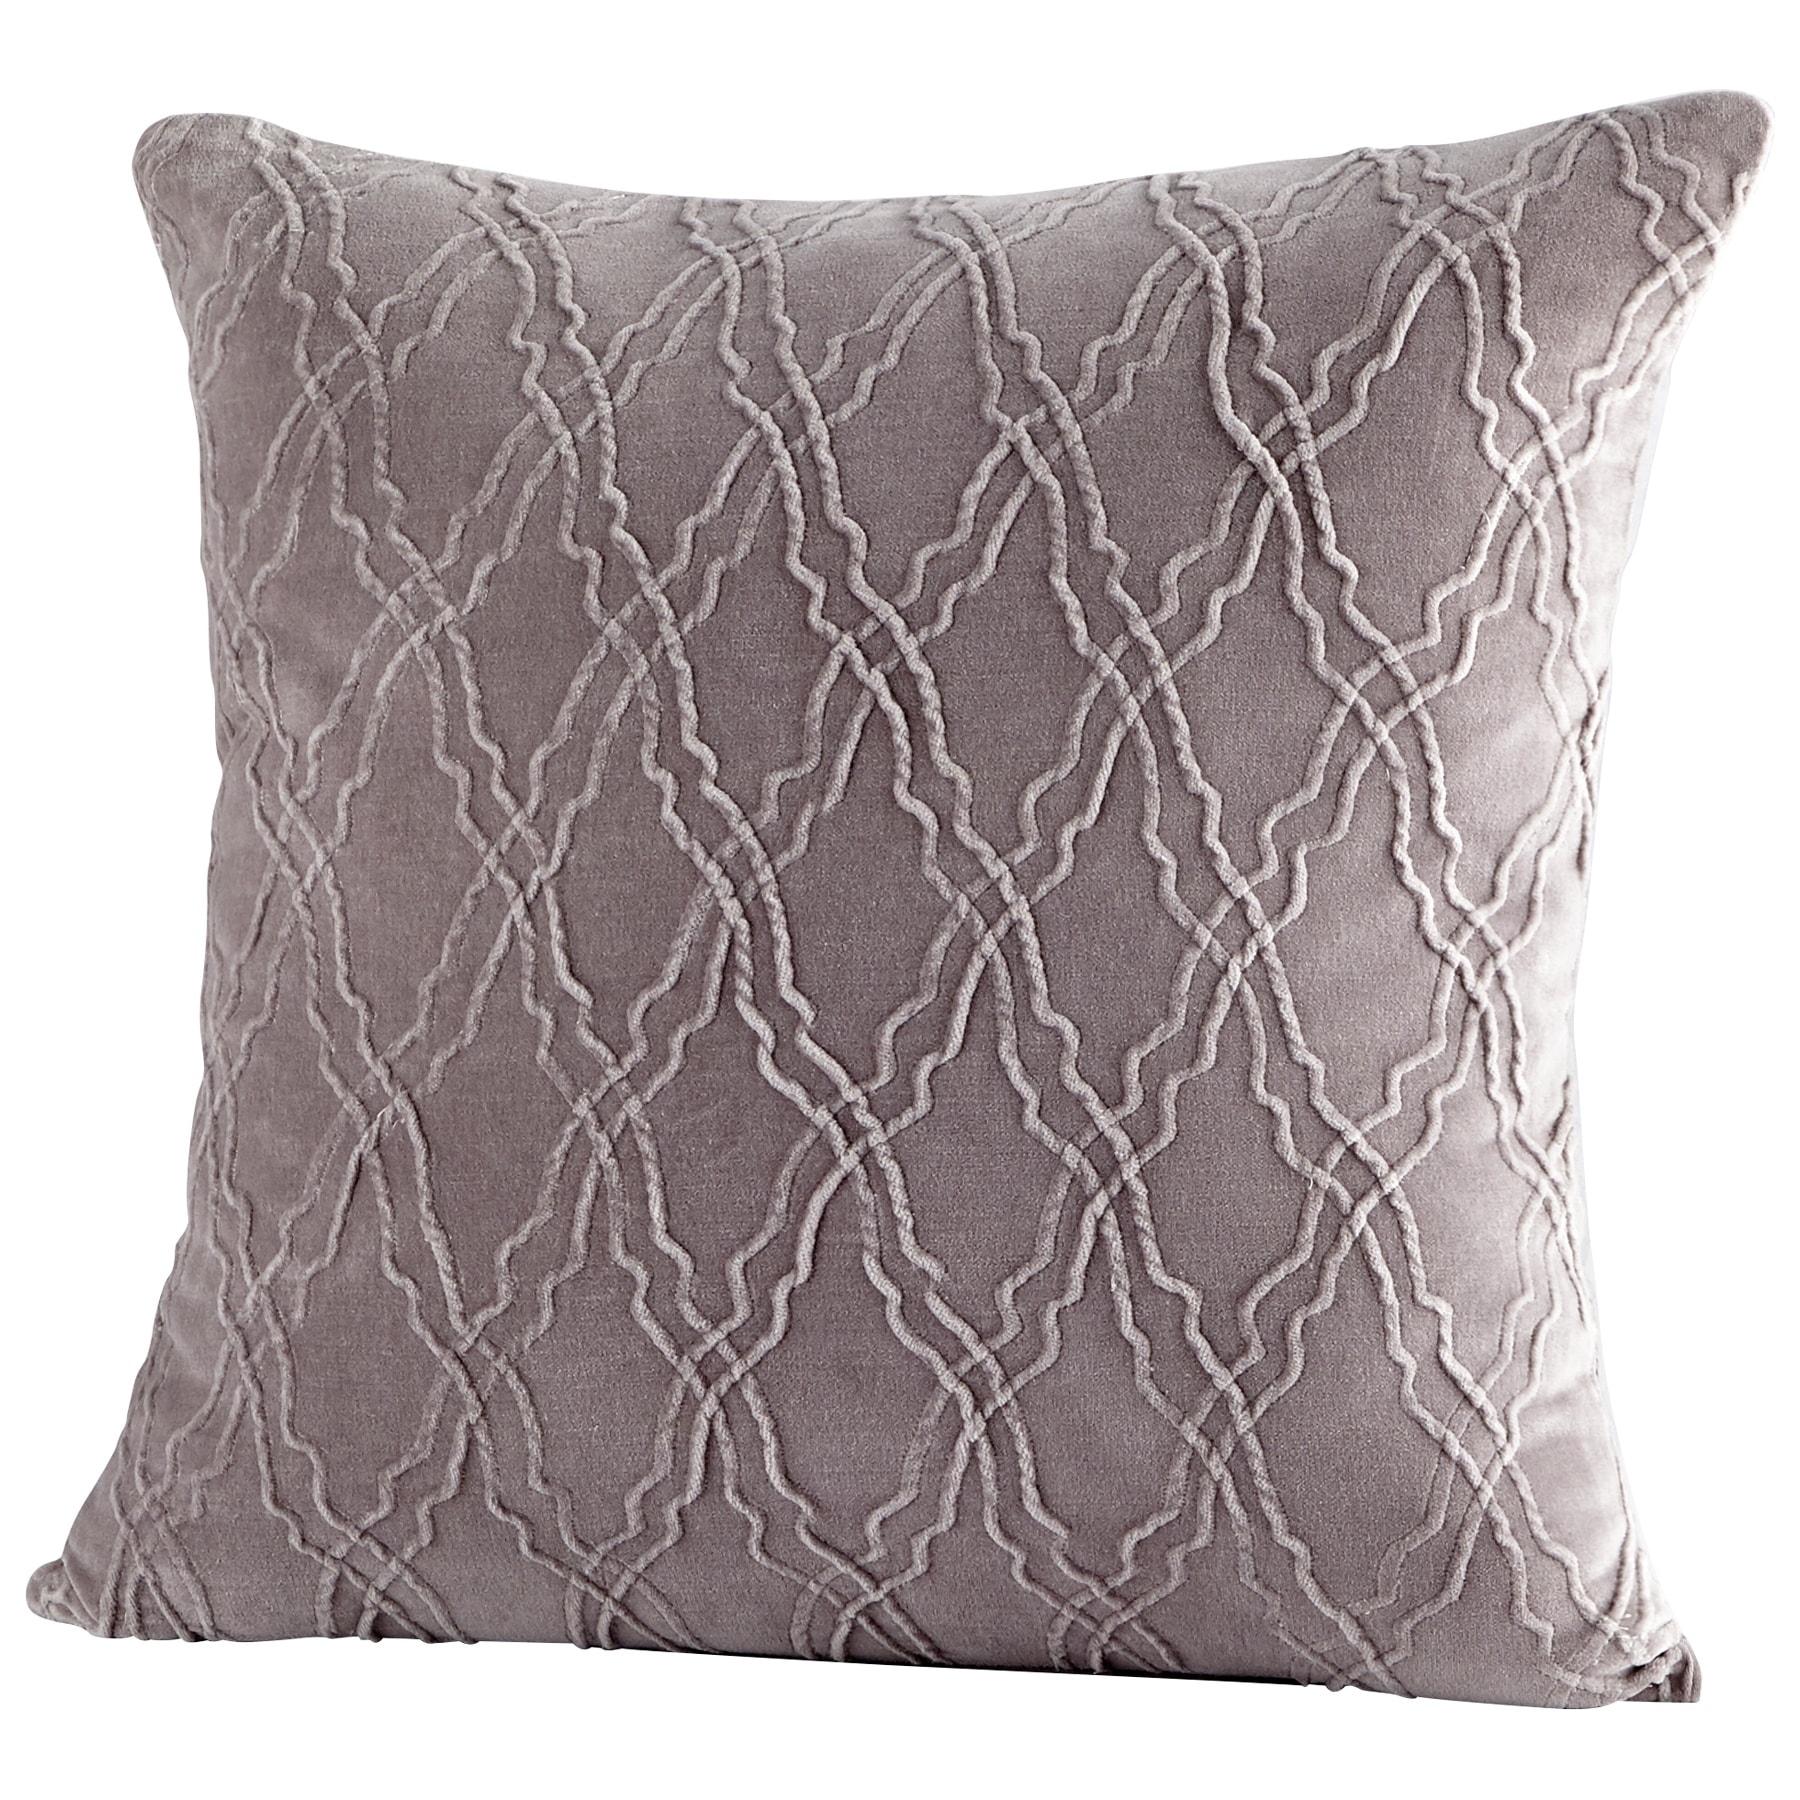 Shop rivori handmade grey accent pillow free shipping today overstock com 23479812